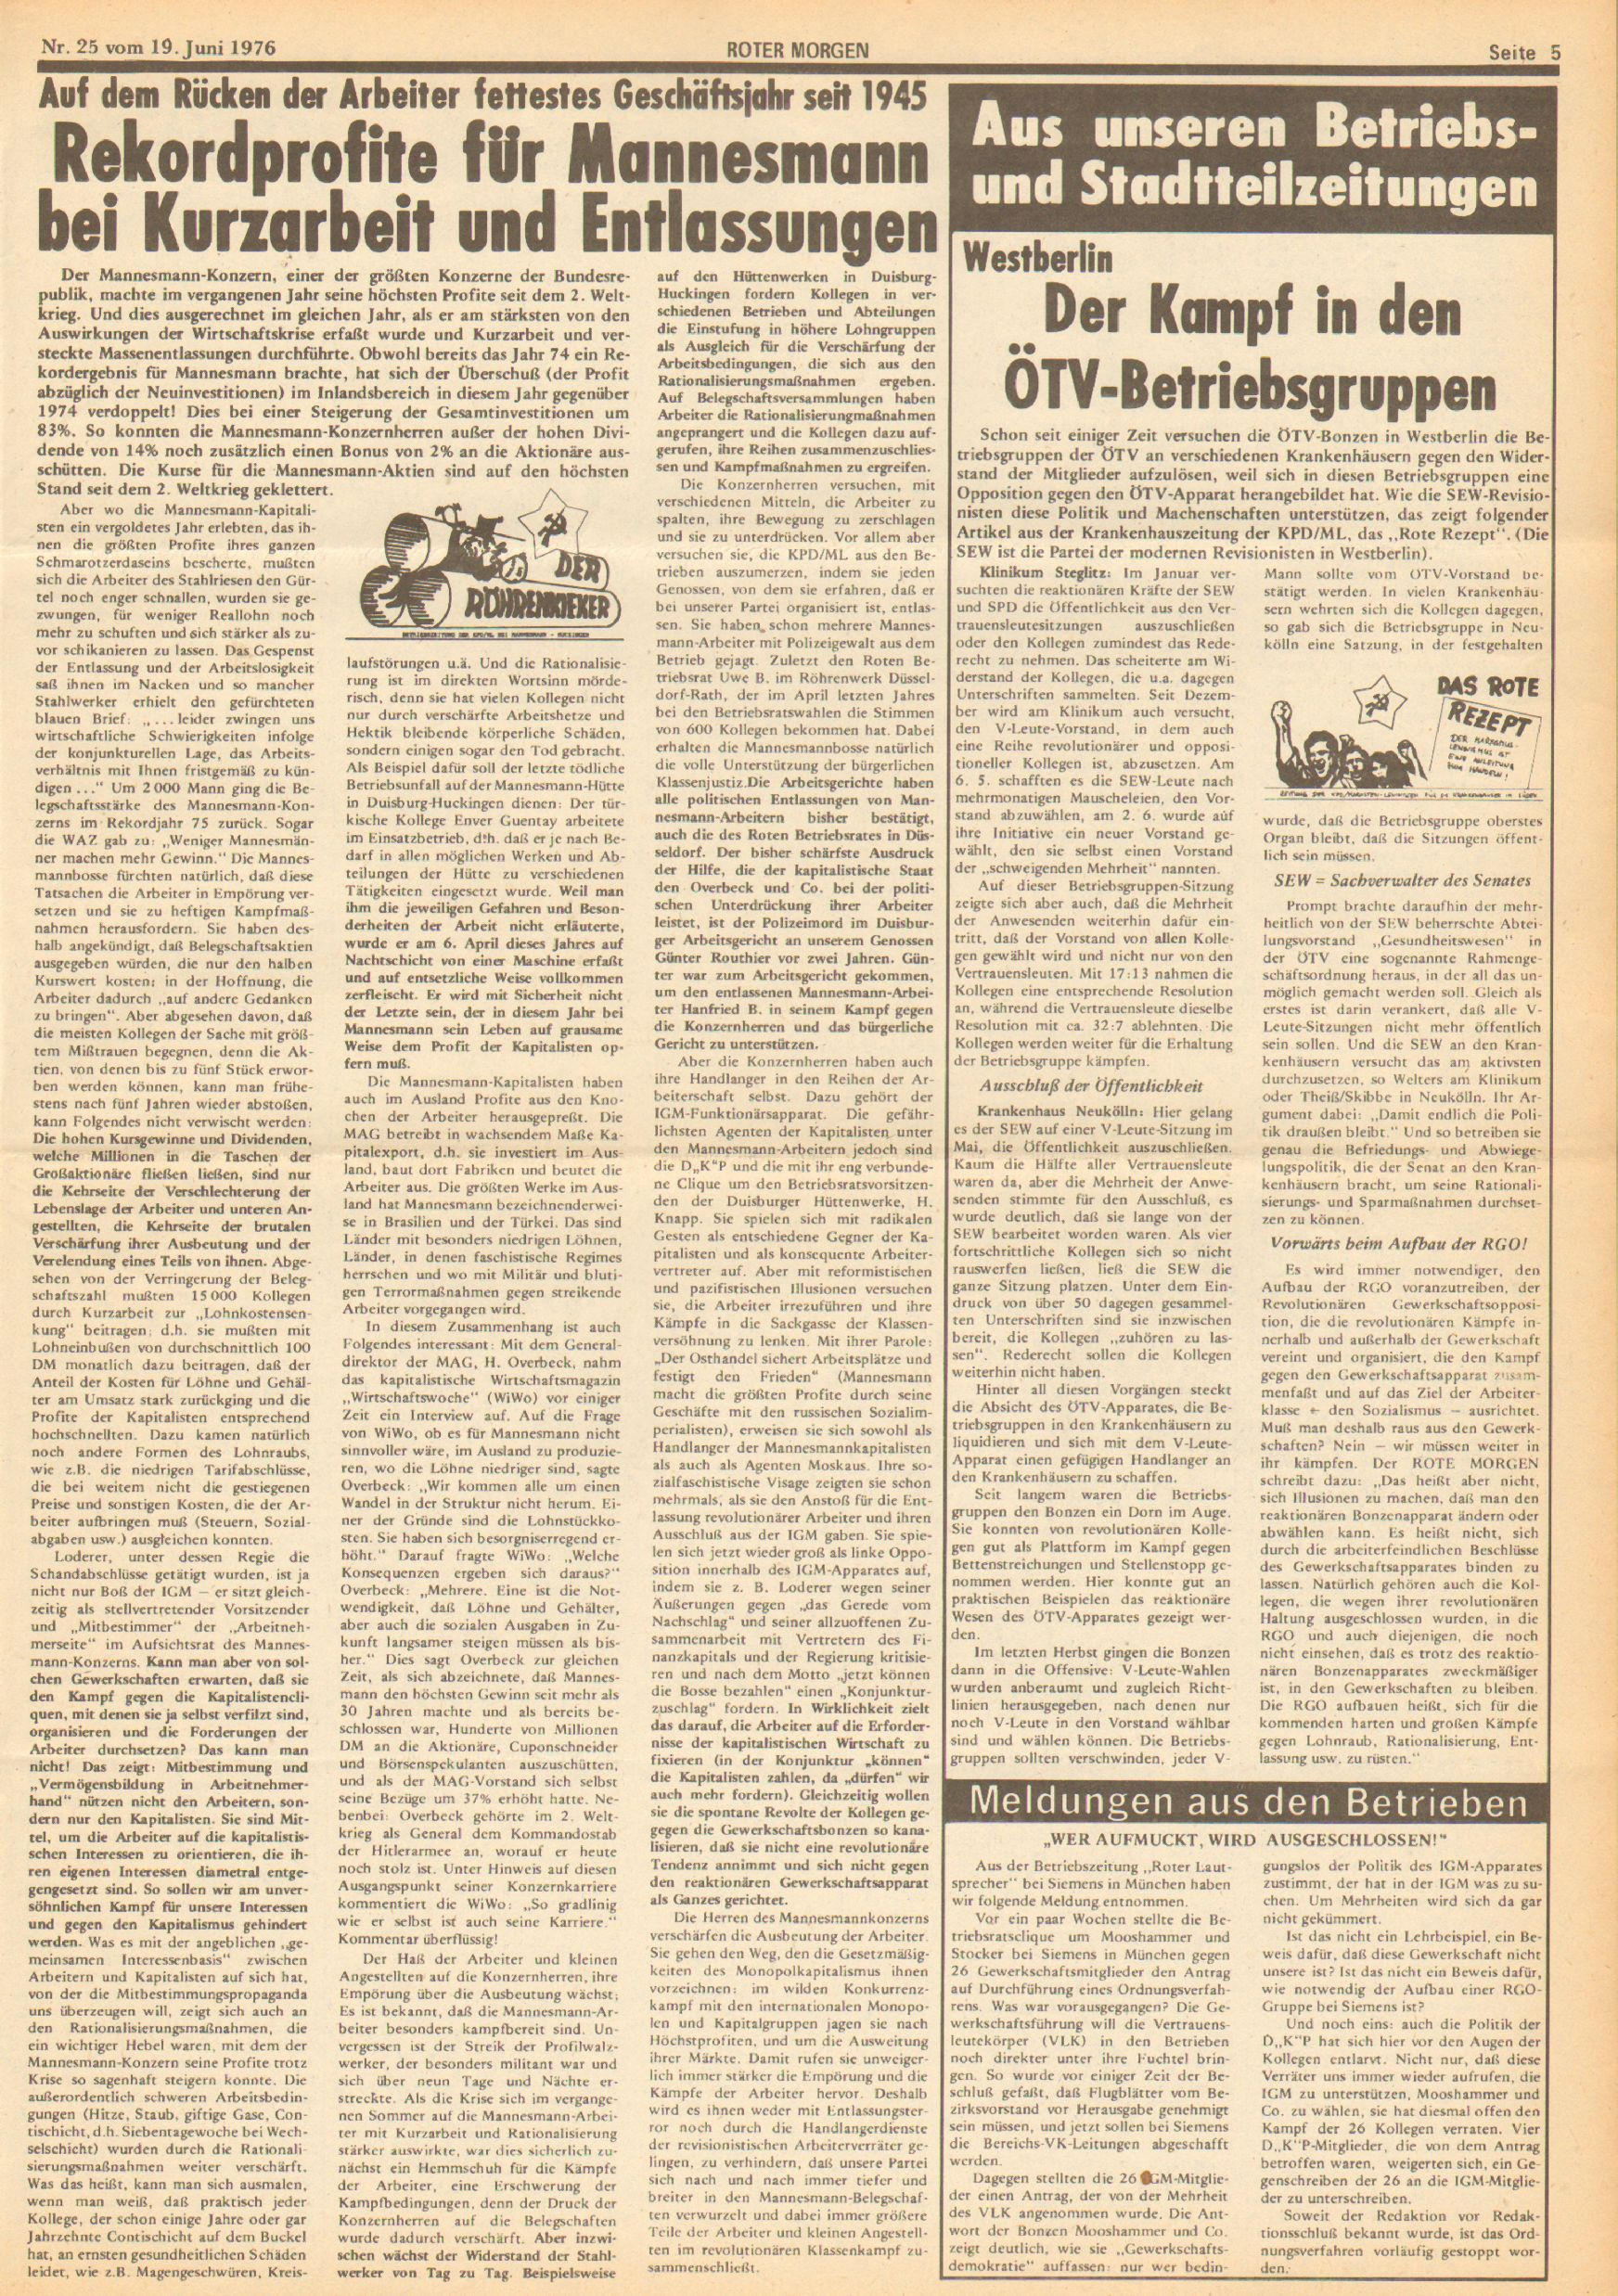 Roter Morgen, 10. Jg., 19. Juni 1976, Nr. 25, Seite 5